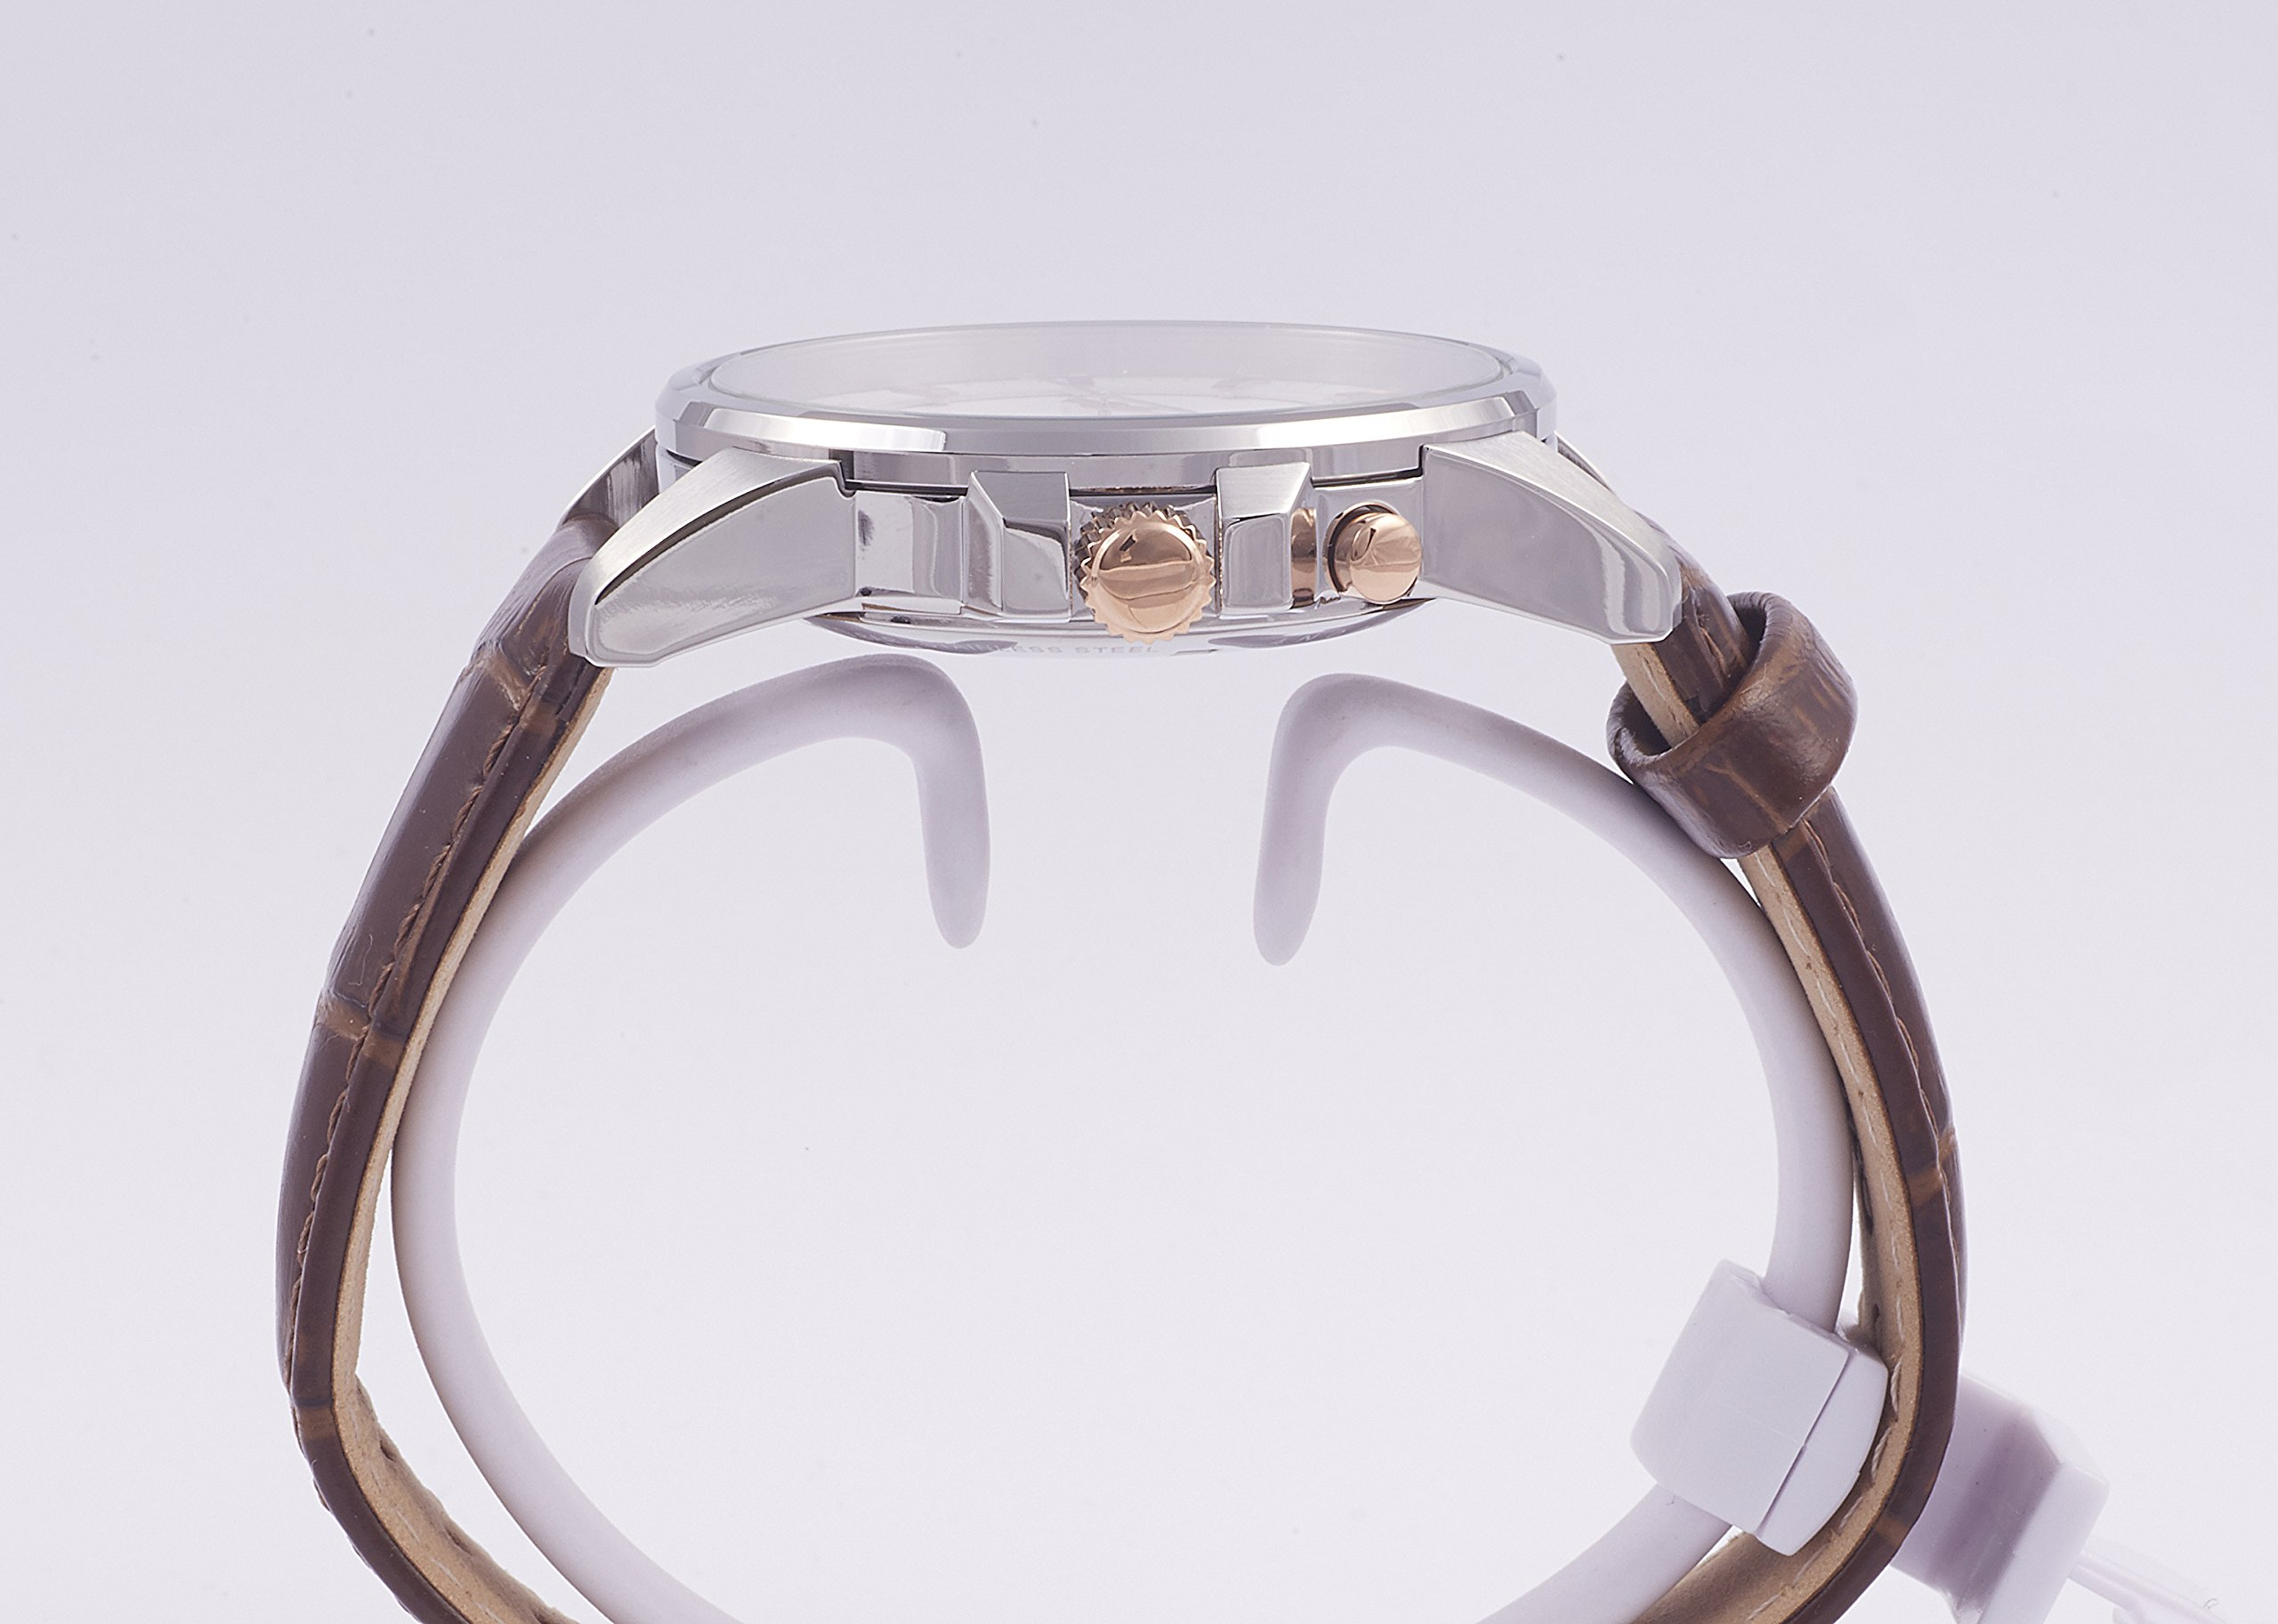 Seiko-Herren-Analog-Kinetik-Uhr-mit-Leder-Armband-SKA669J1